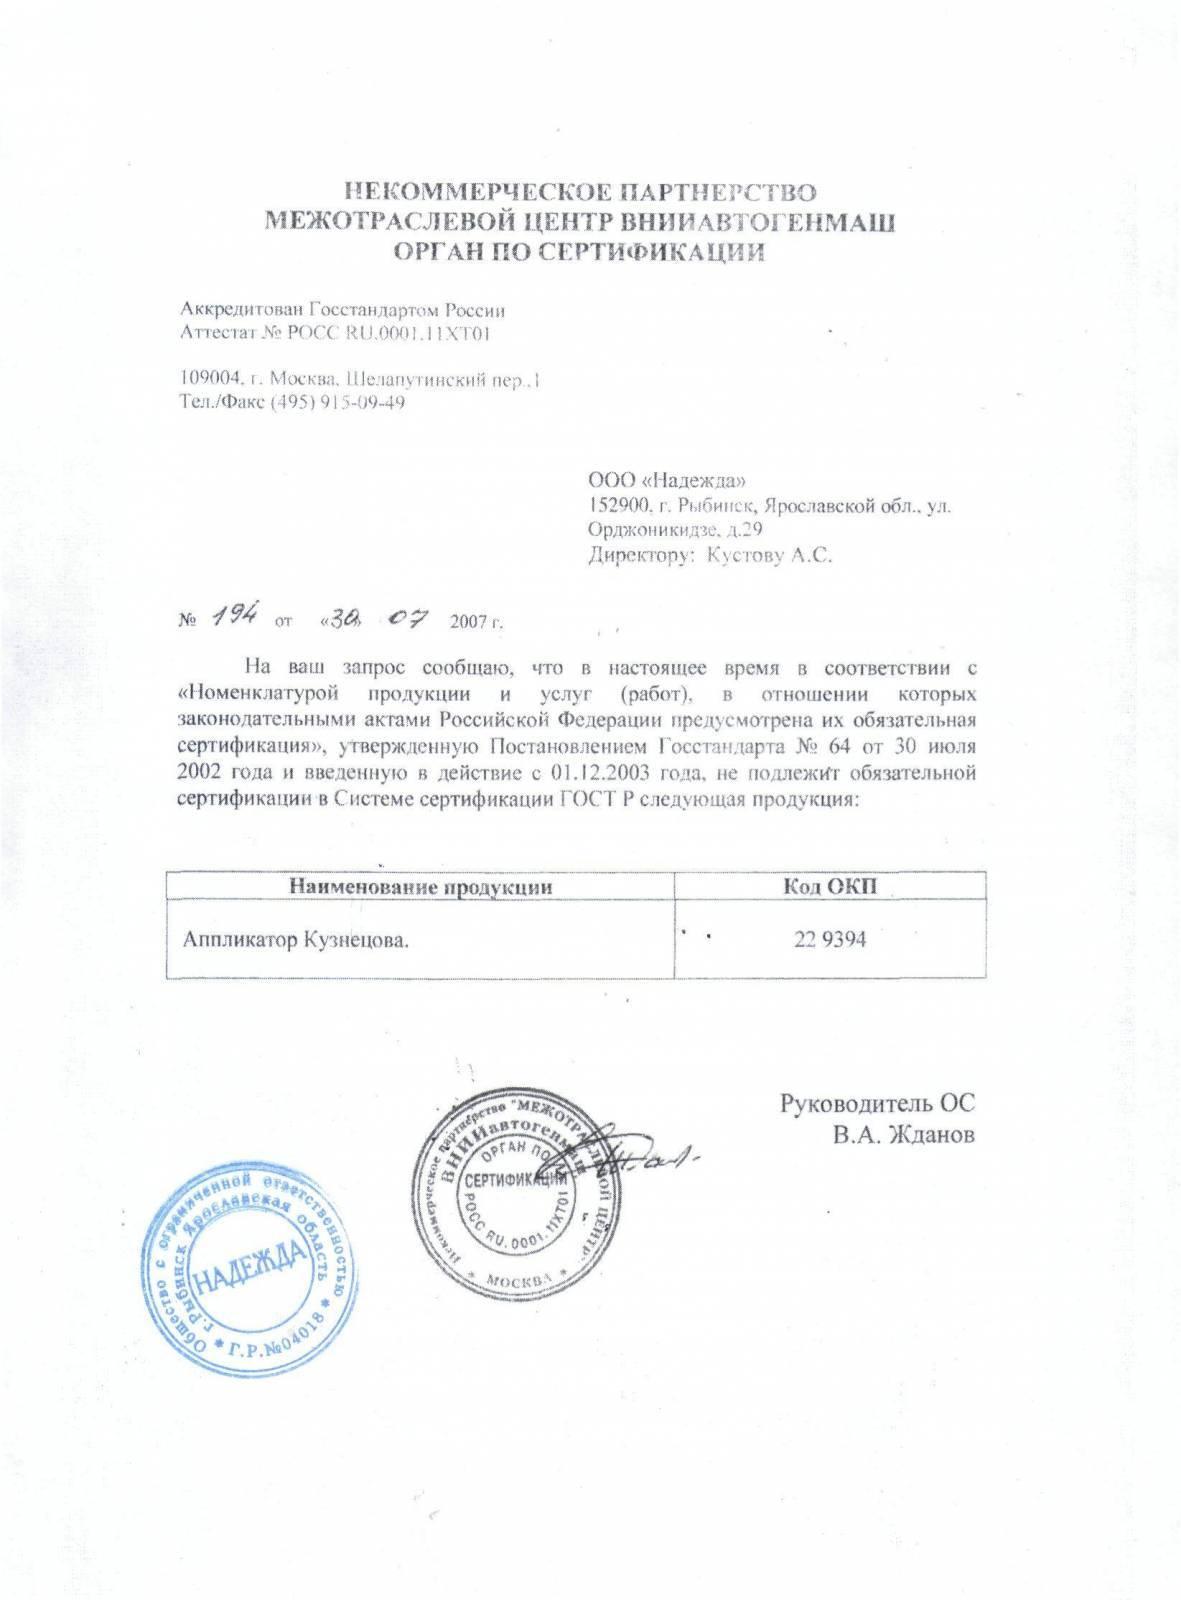 «Аппликатор Кузнецова» (56 модулей на тканевой основе)